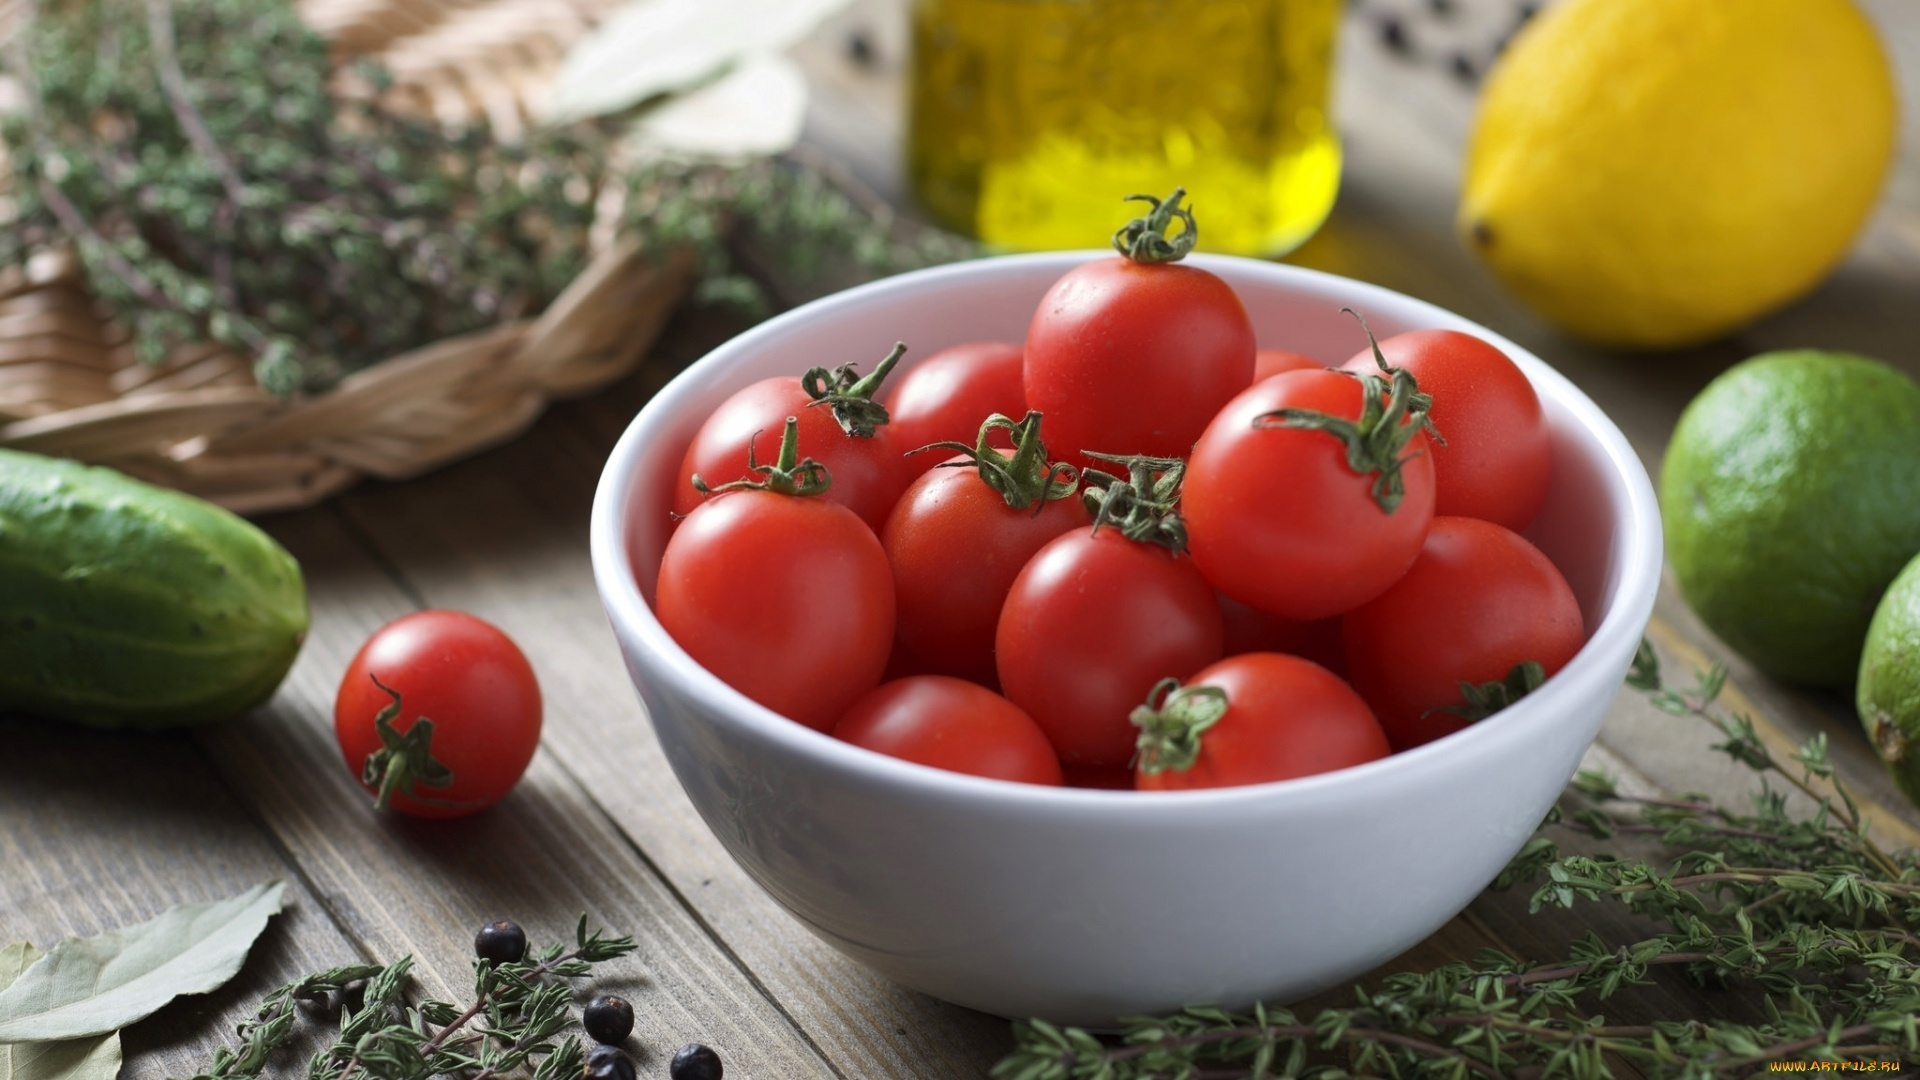 Tomatoes Full HD Wallpaper